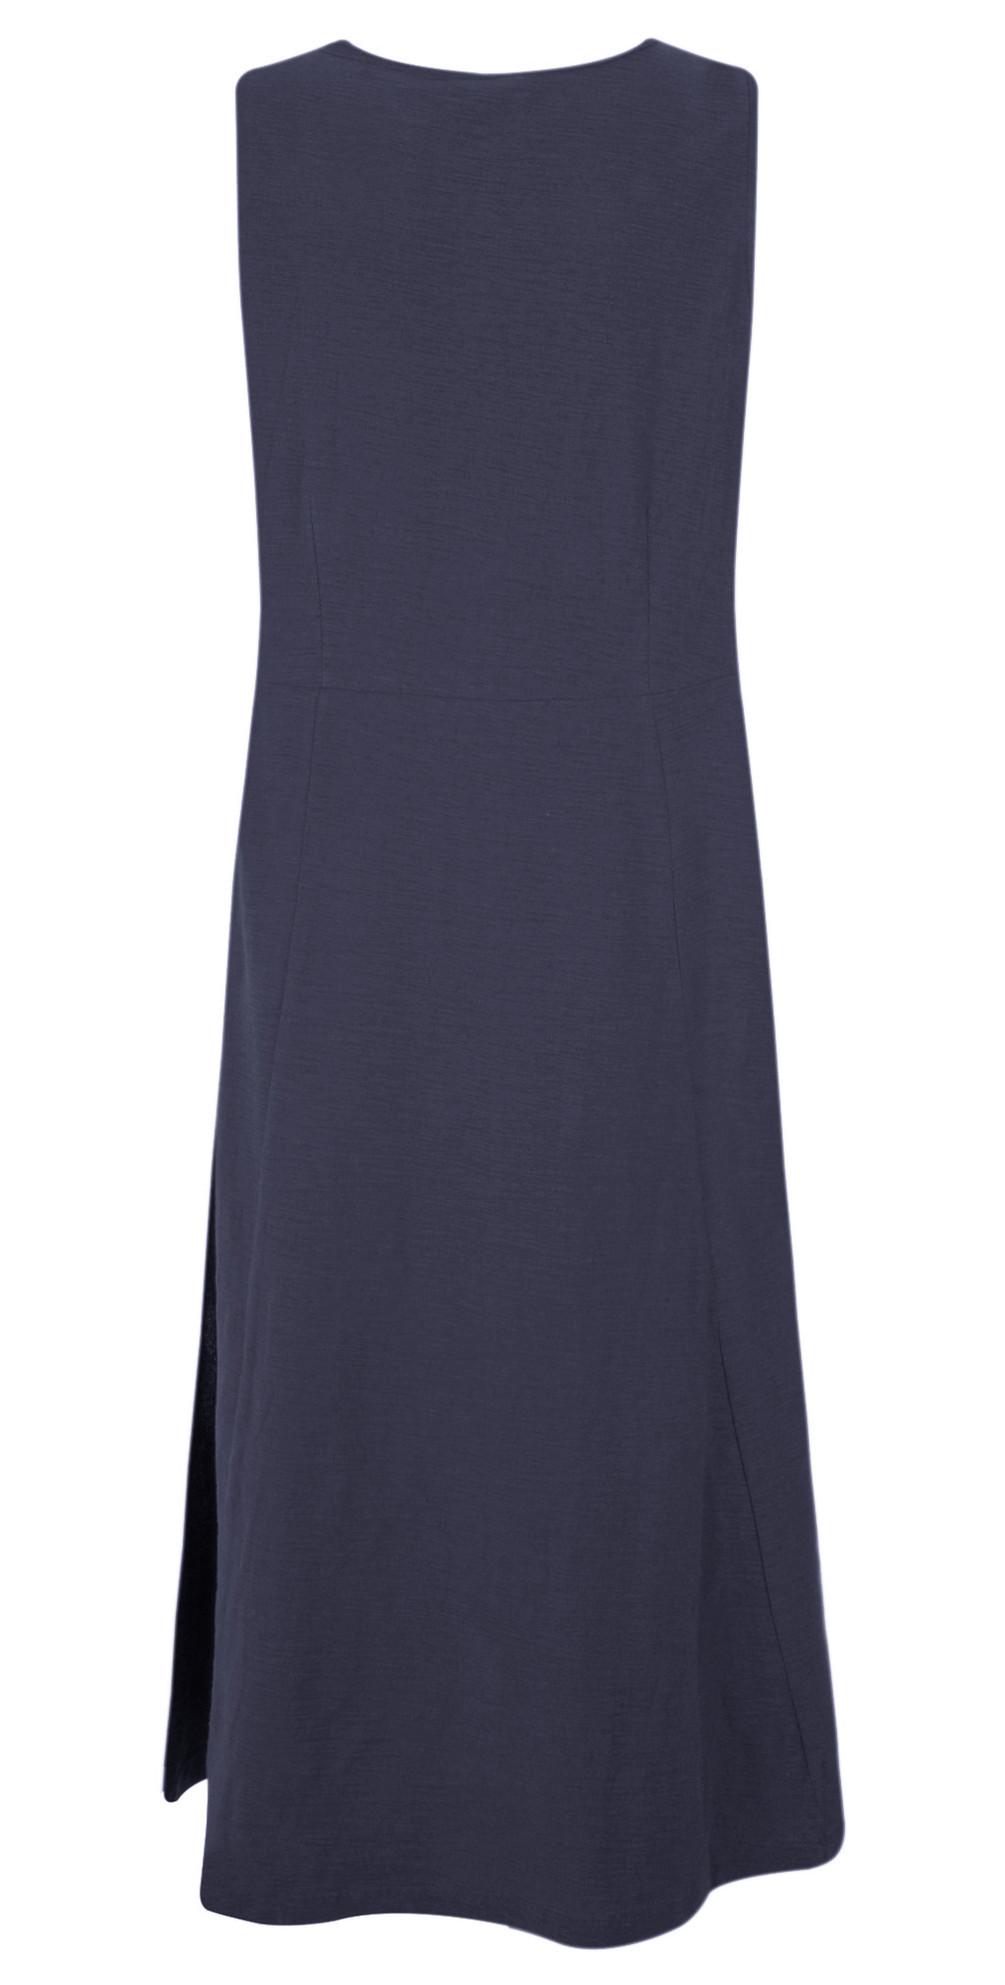 Cotton Slub Emmie Dress main image